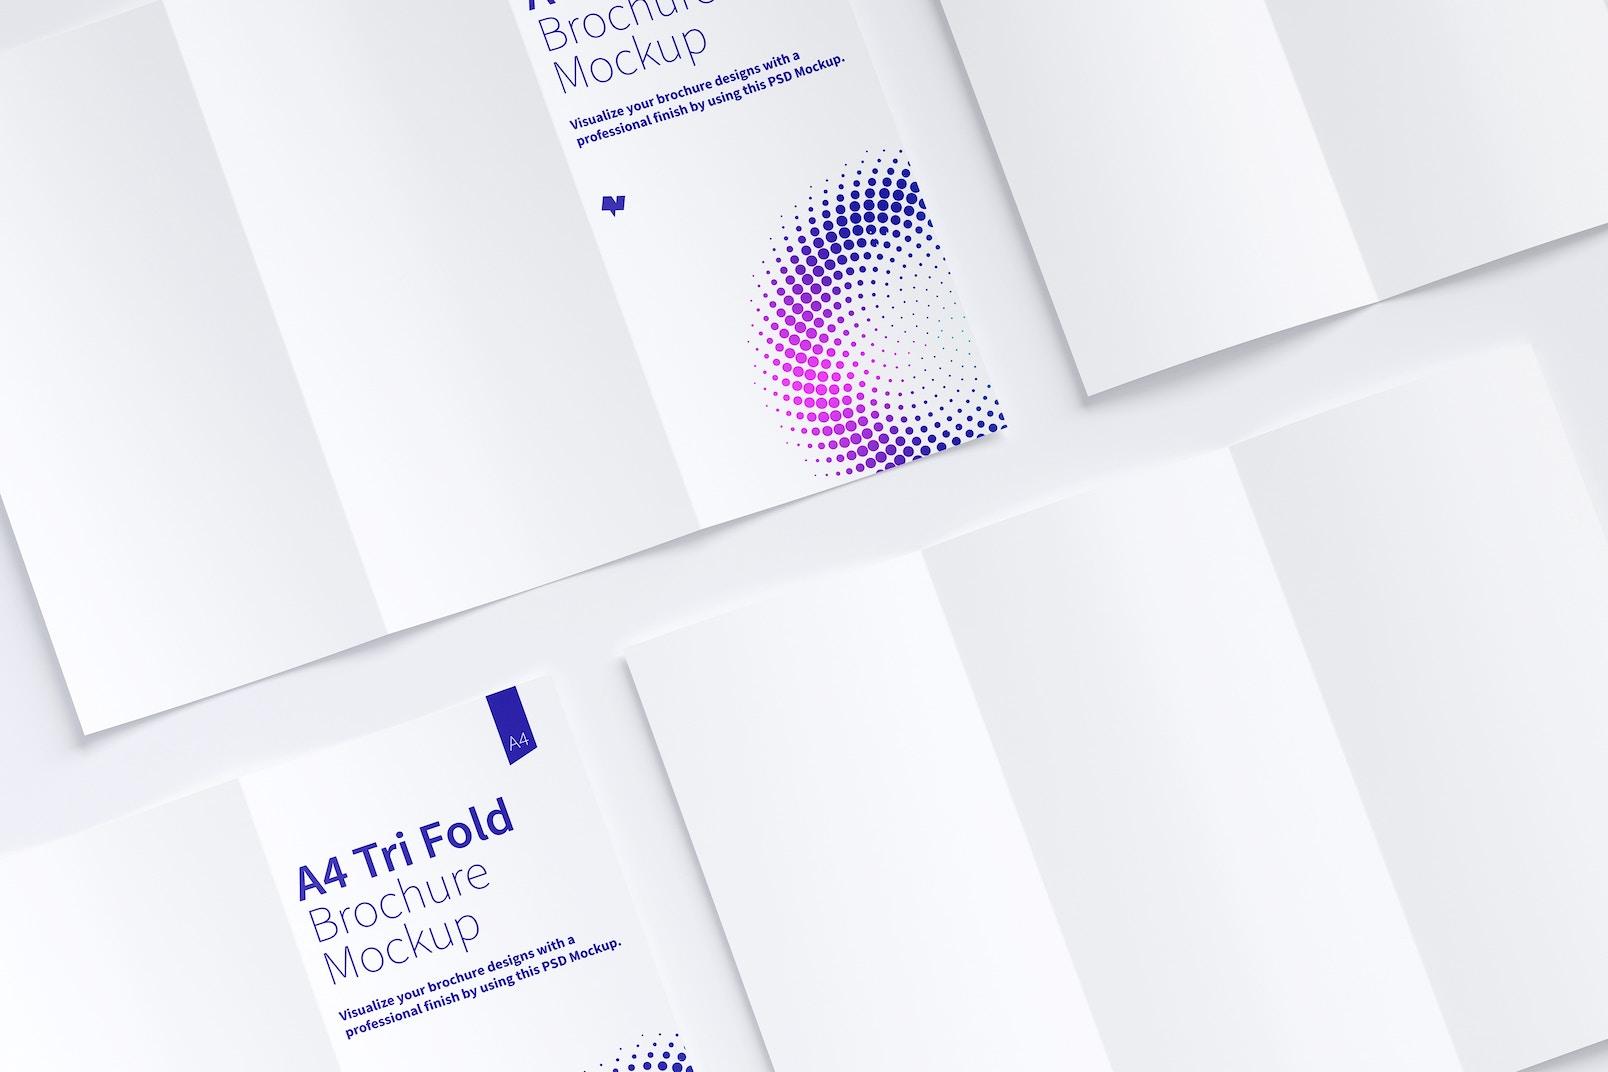 A4 Trifold Brochure Mockup 07